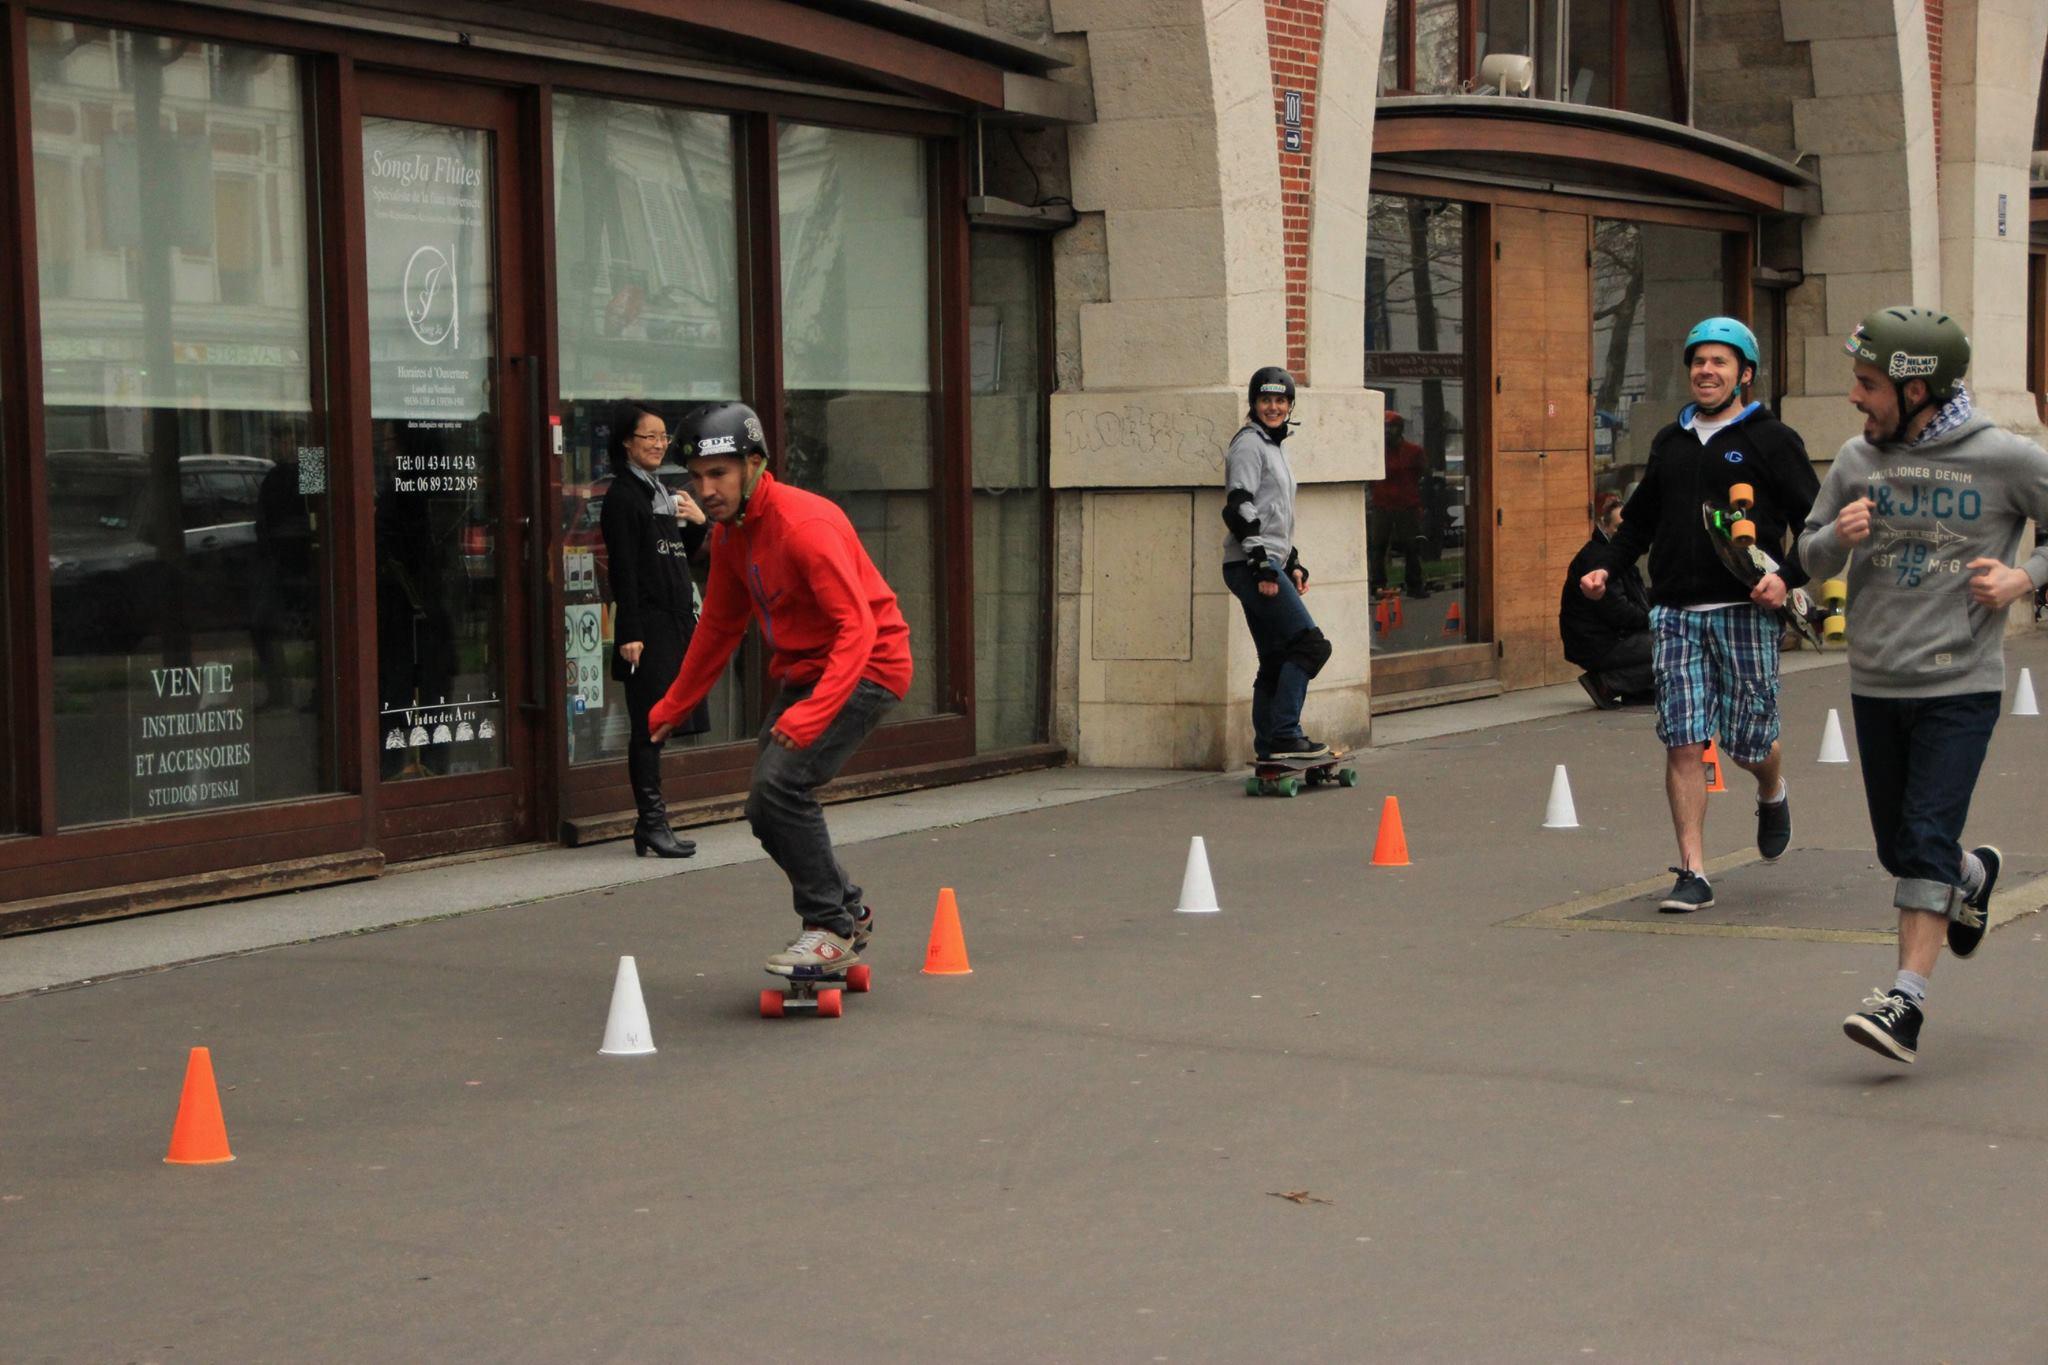 Vincent - Pirate Slalom Skateboard Riderz Paris 12